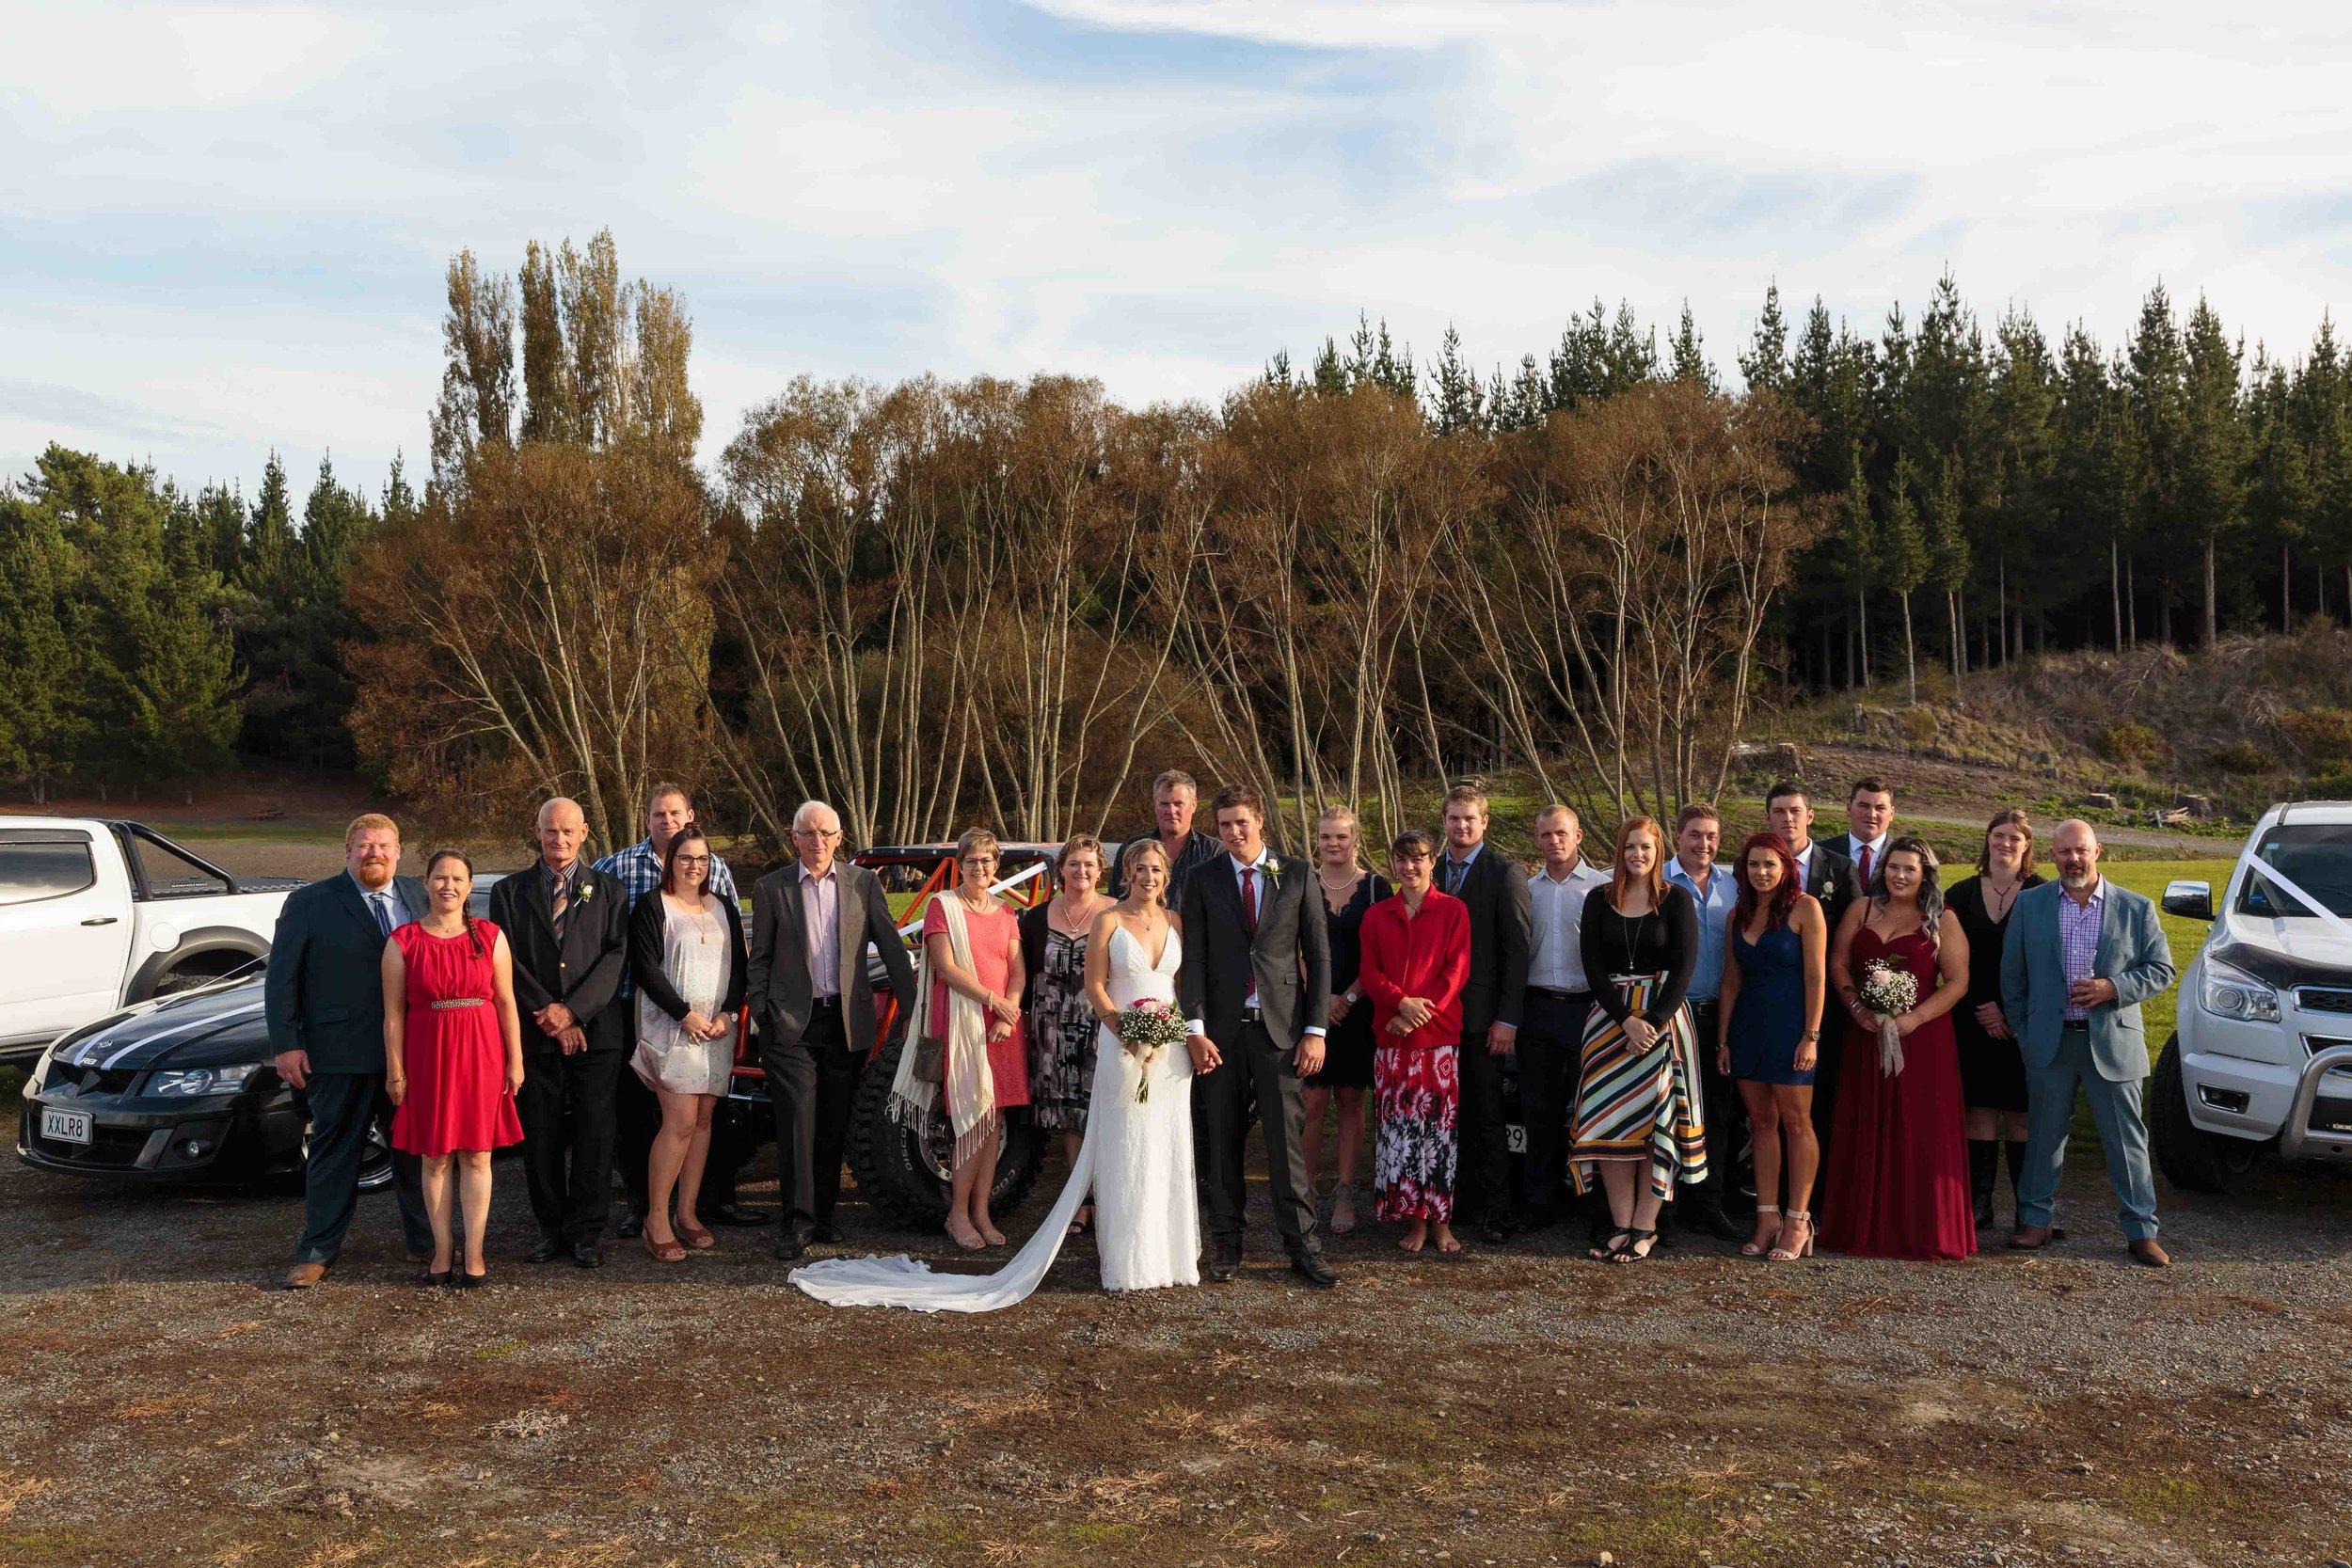 Highight-wedding-photography-dudding-lake-palmerston-north-new-zealand-50.jpg